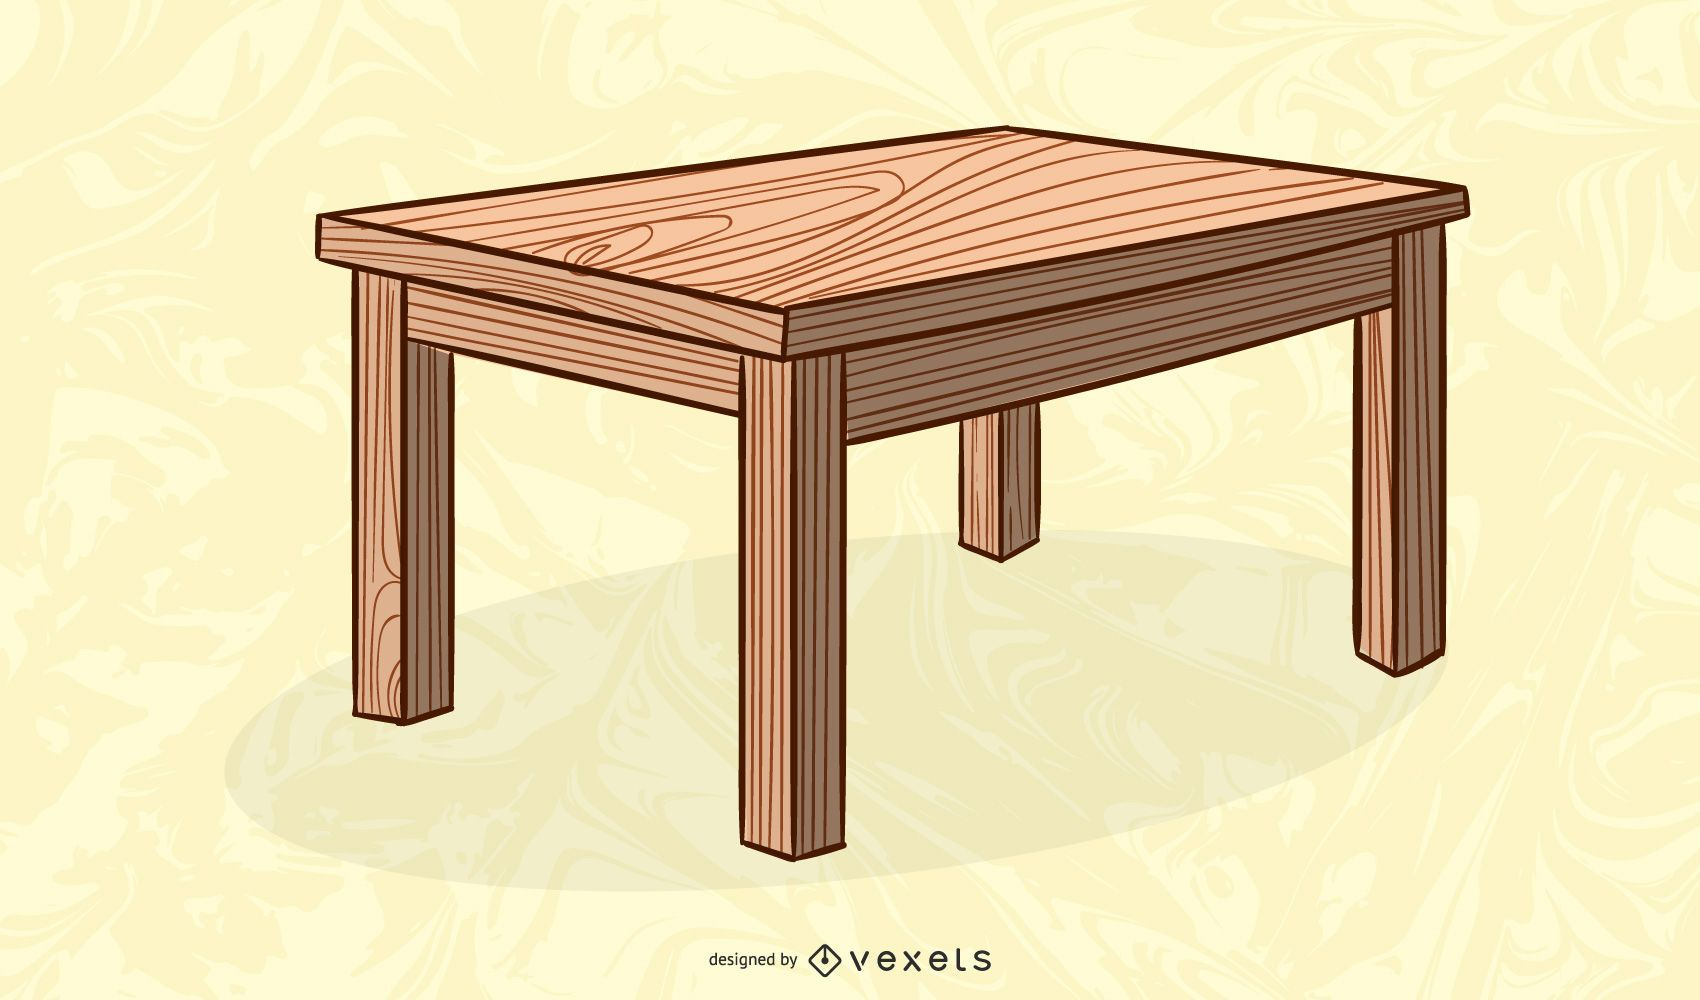 rectangular wooden table illustration